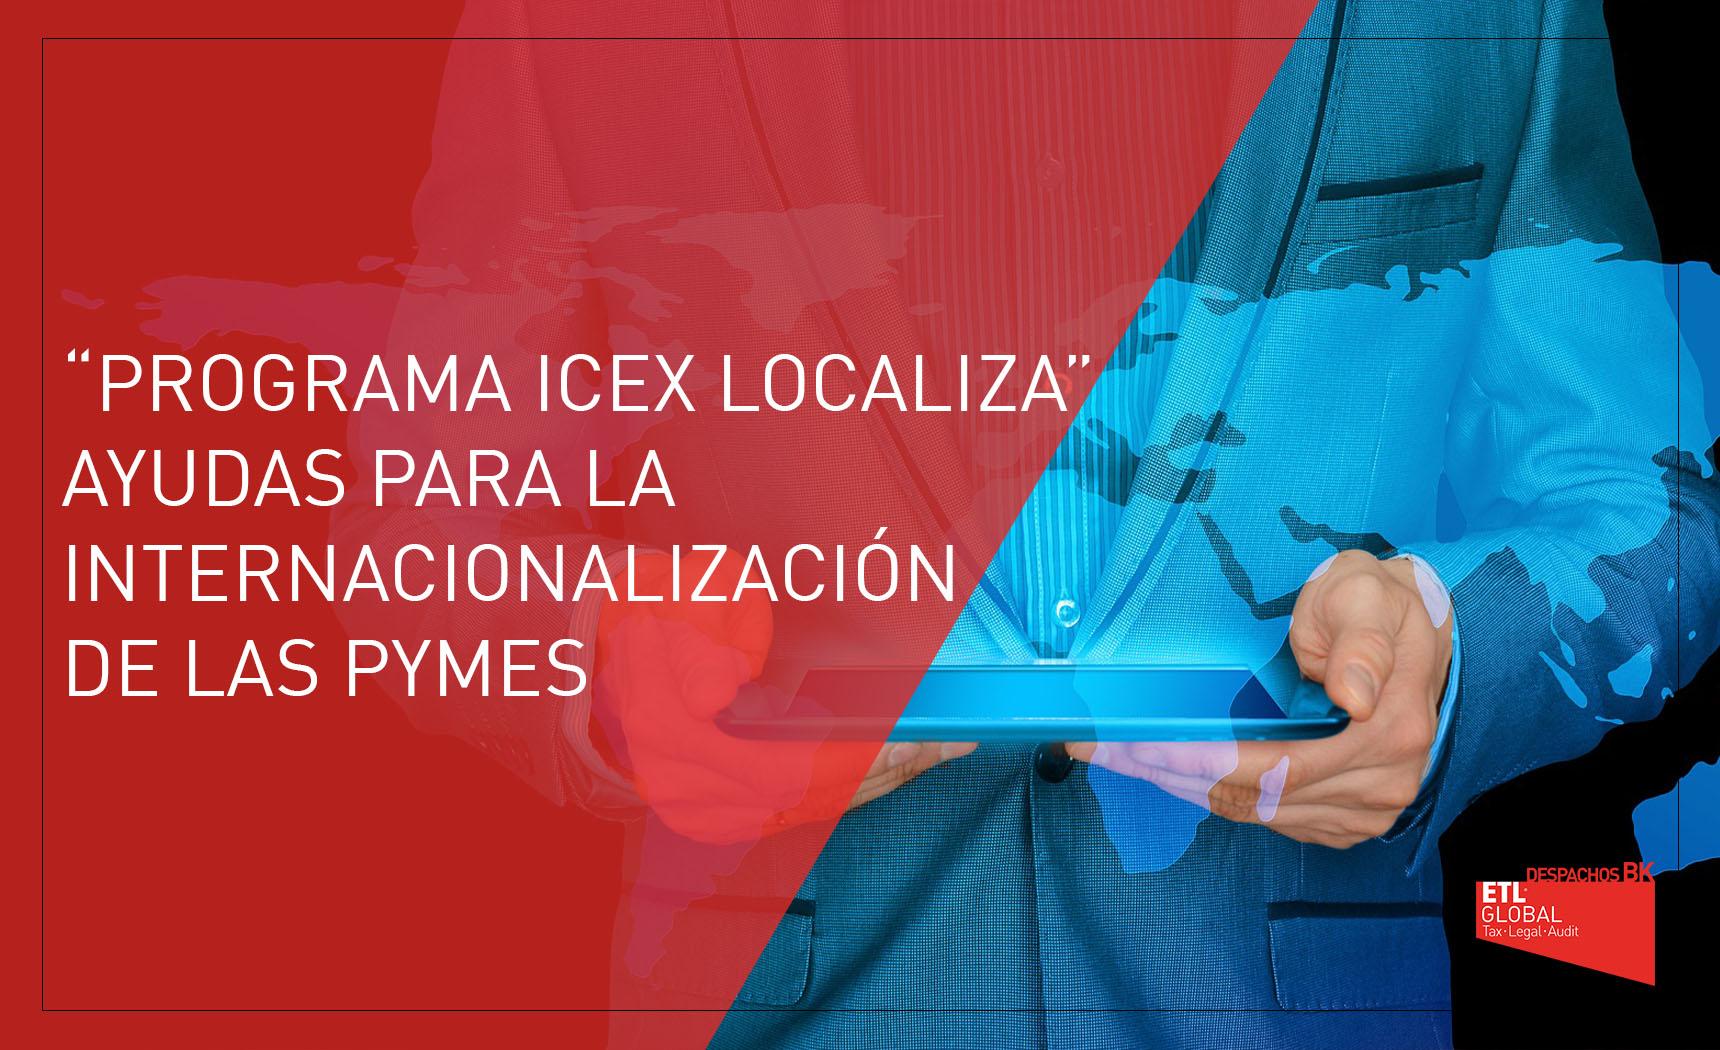 programa icex localiza